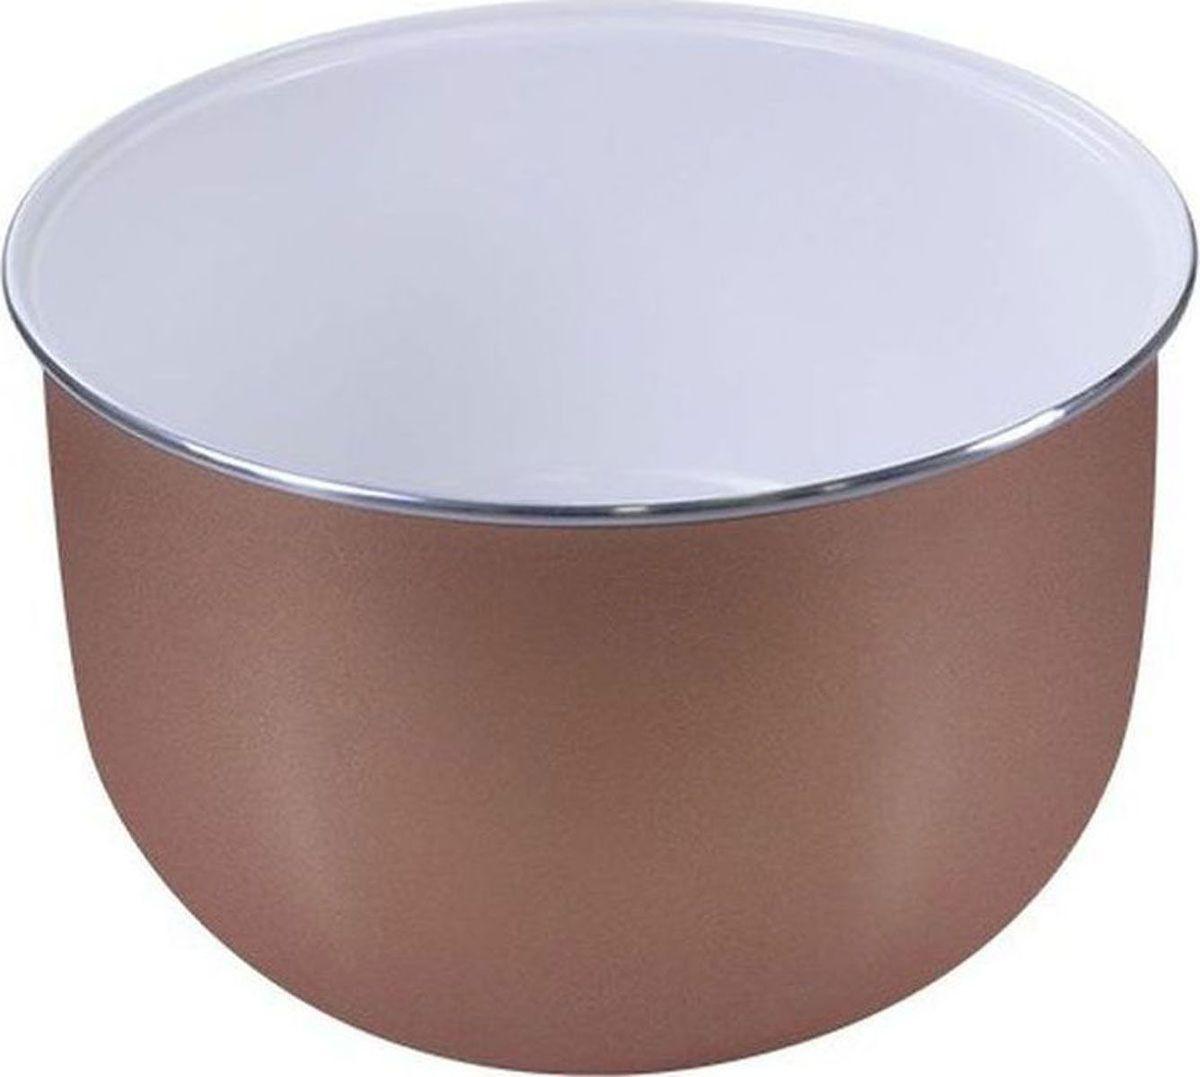 Lumme LU-MC304, White чаша для мультиварки, 5 лLU-MC304Утолщенная чаша для мультиварки, 5 л, керамическое покрытие внутри